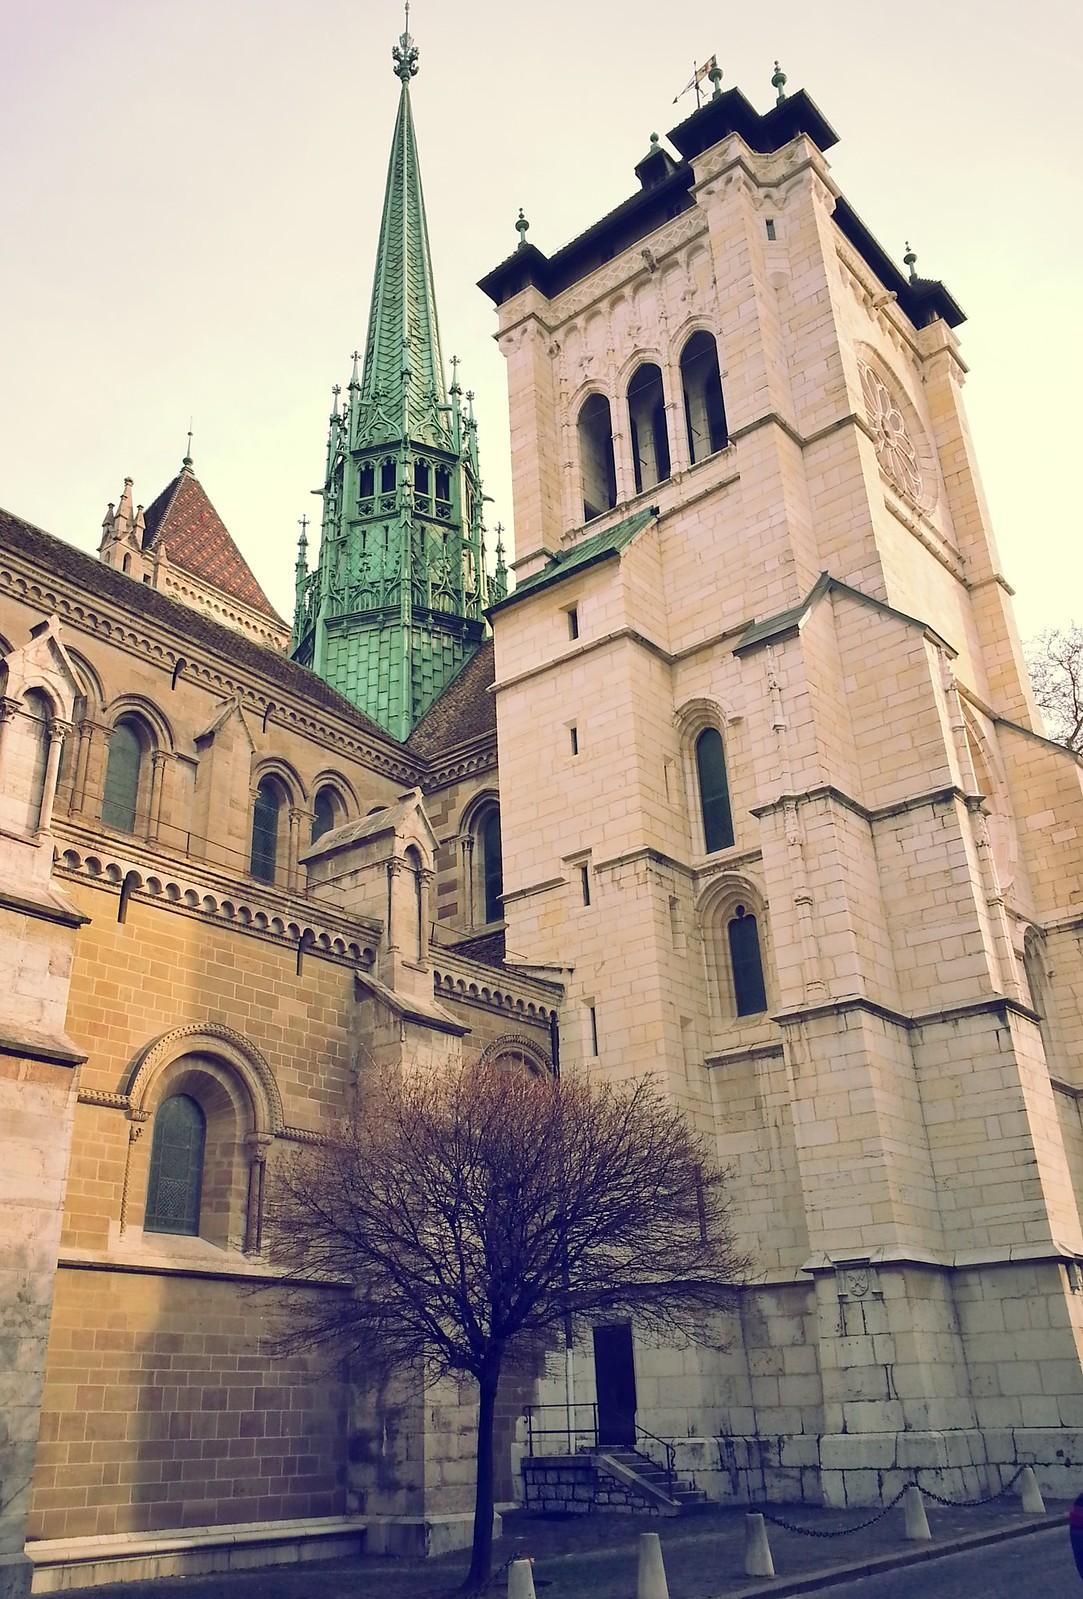 16-01-28 (Geneva) St. Pierre Cathedral.